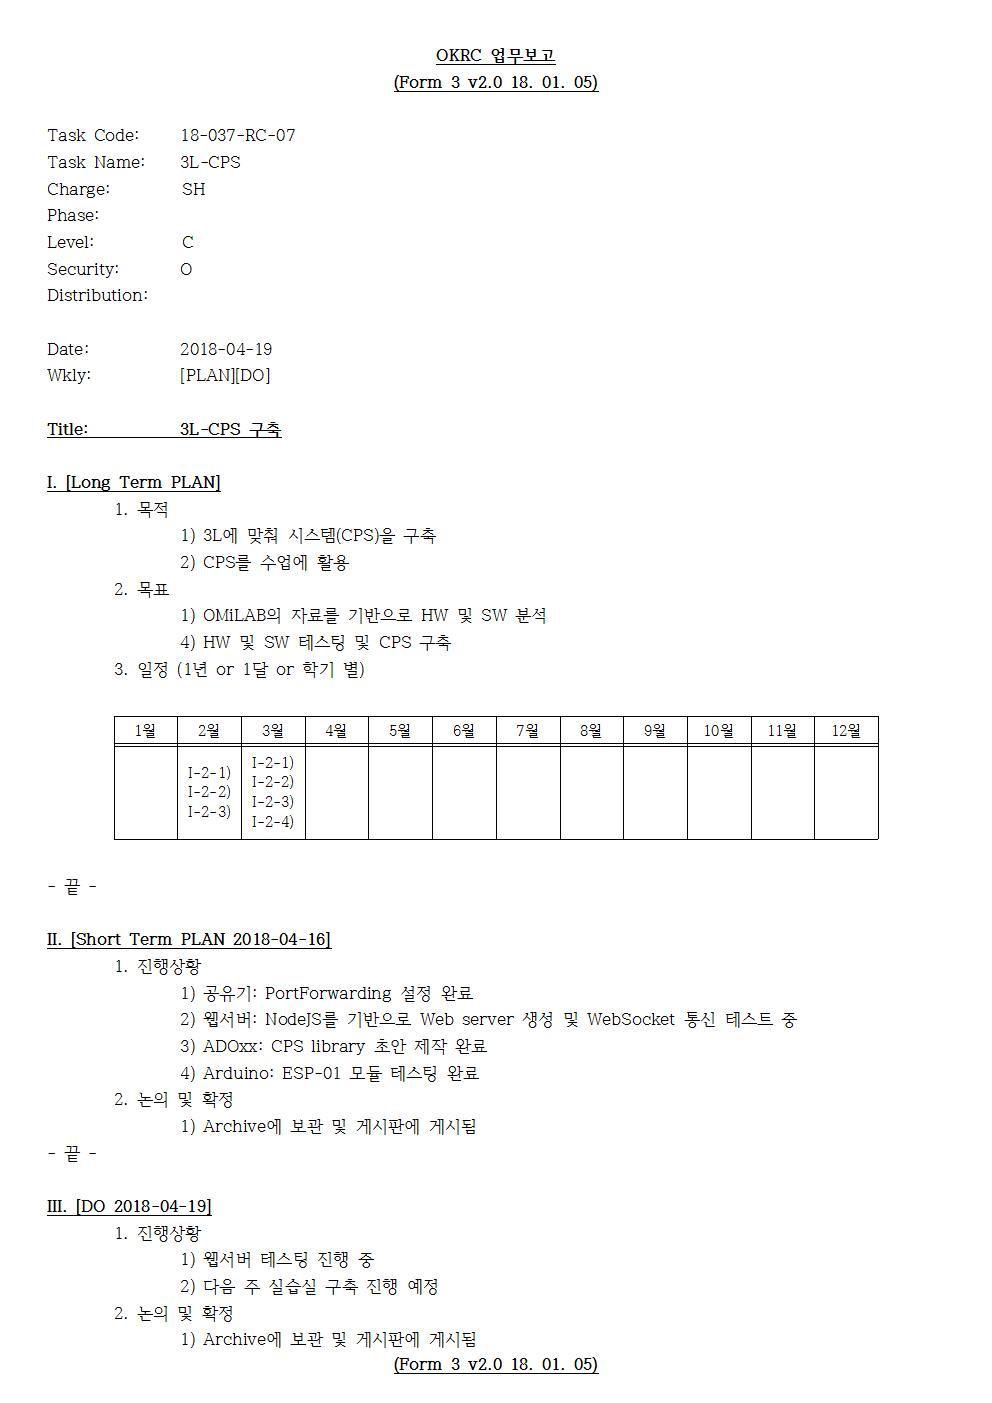 D-[18-037-RC-07]-[3L-CPS]-[2018-04-19][SH]001.jpg